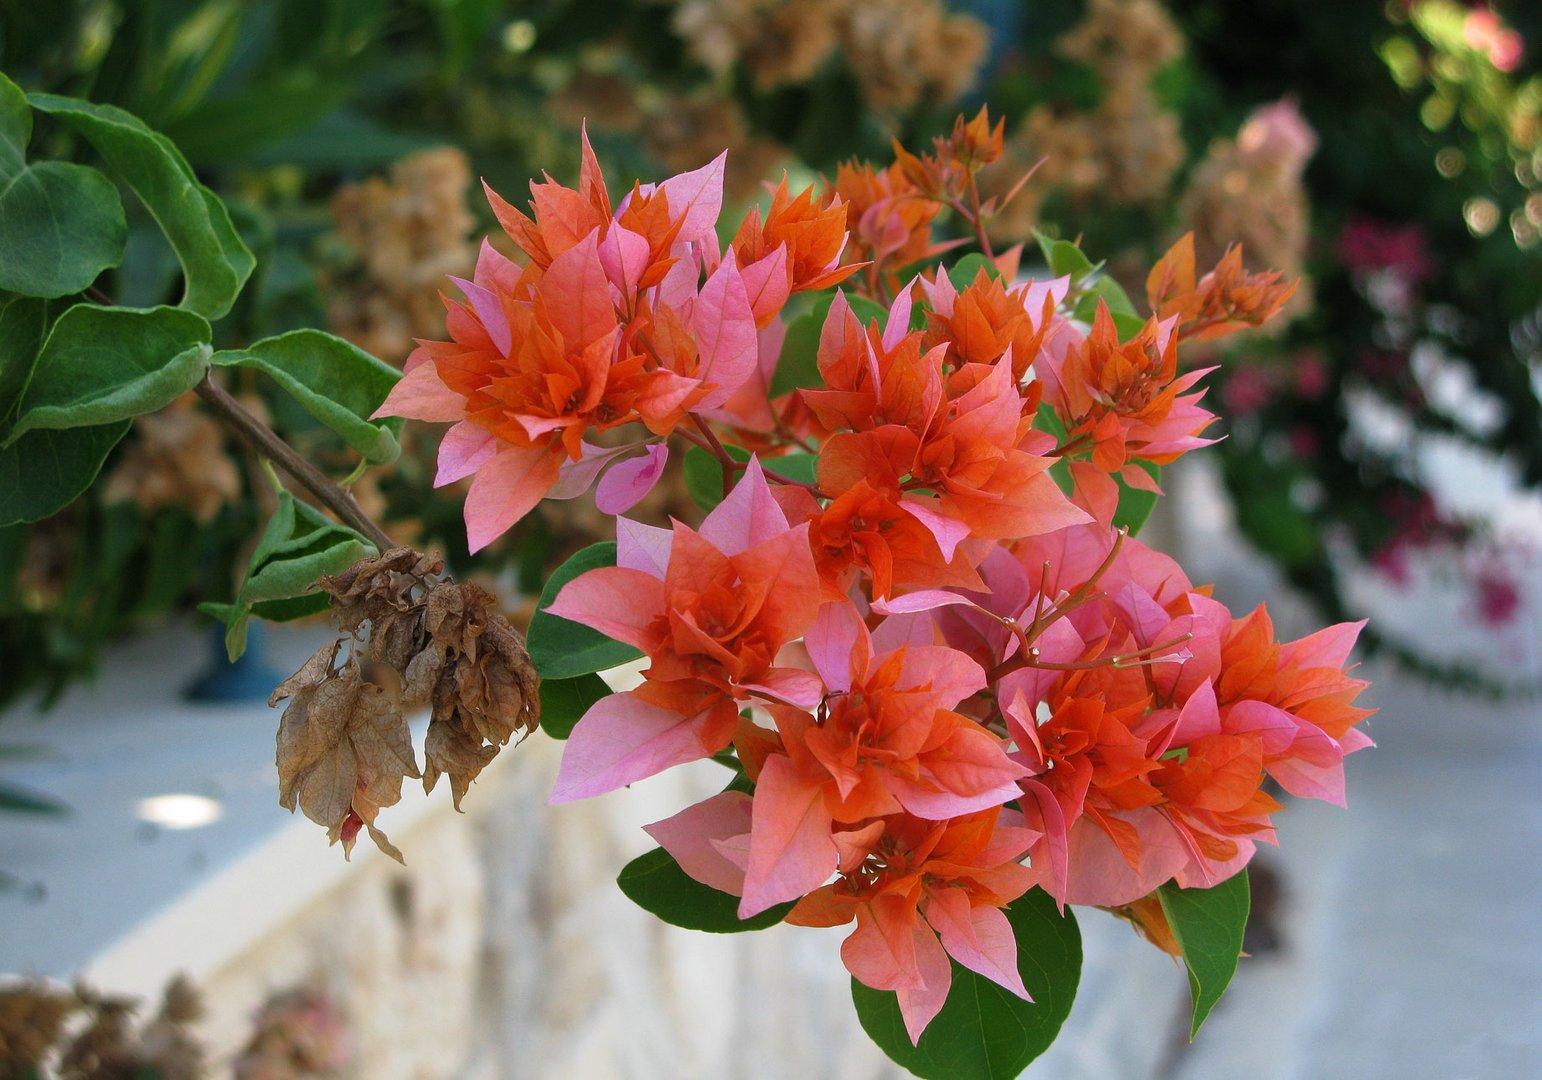 Zypern: Blütenpracht am Wegesrand